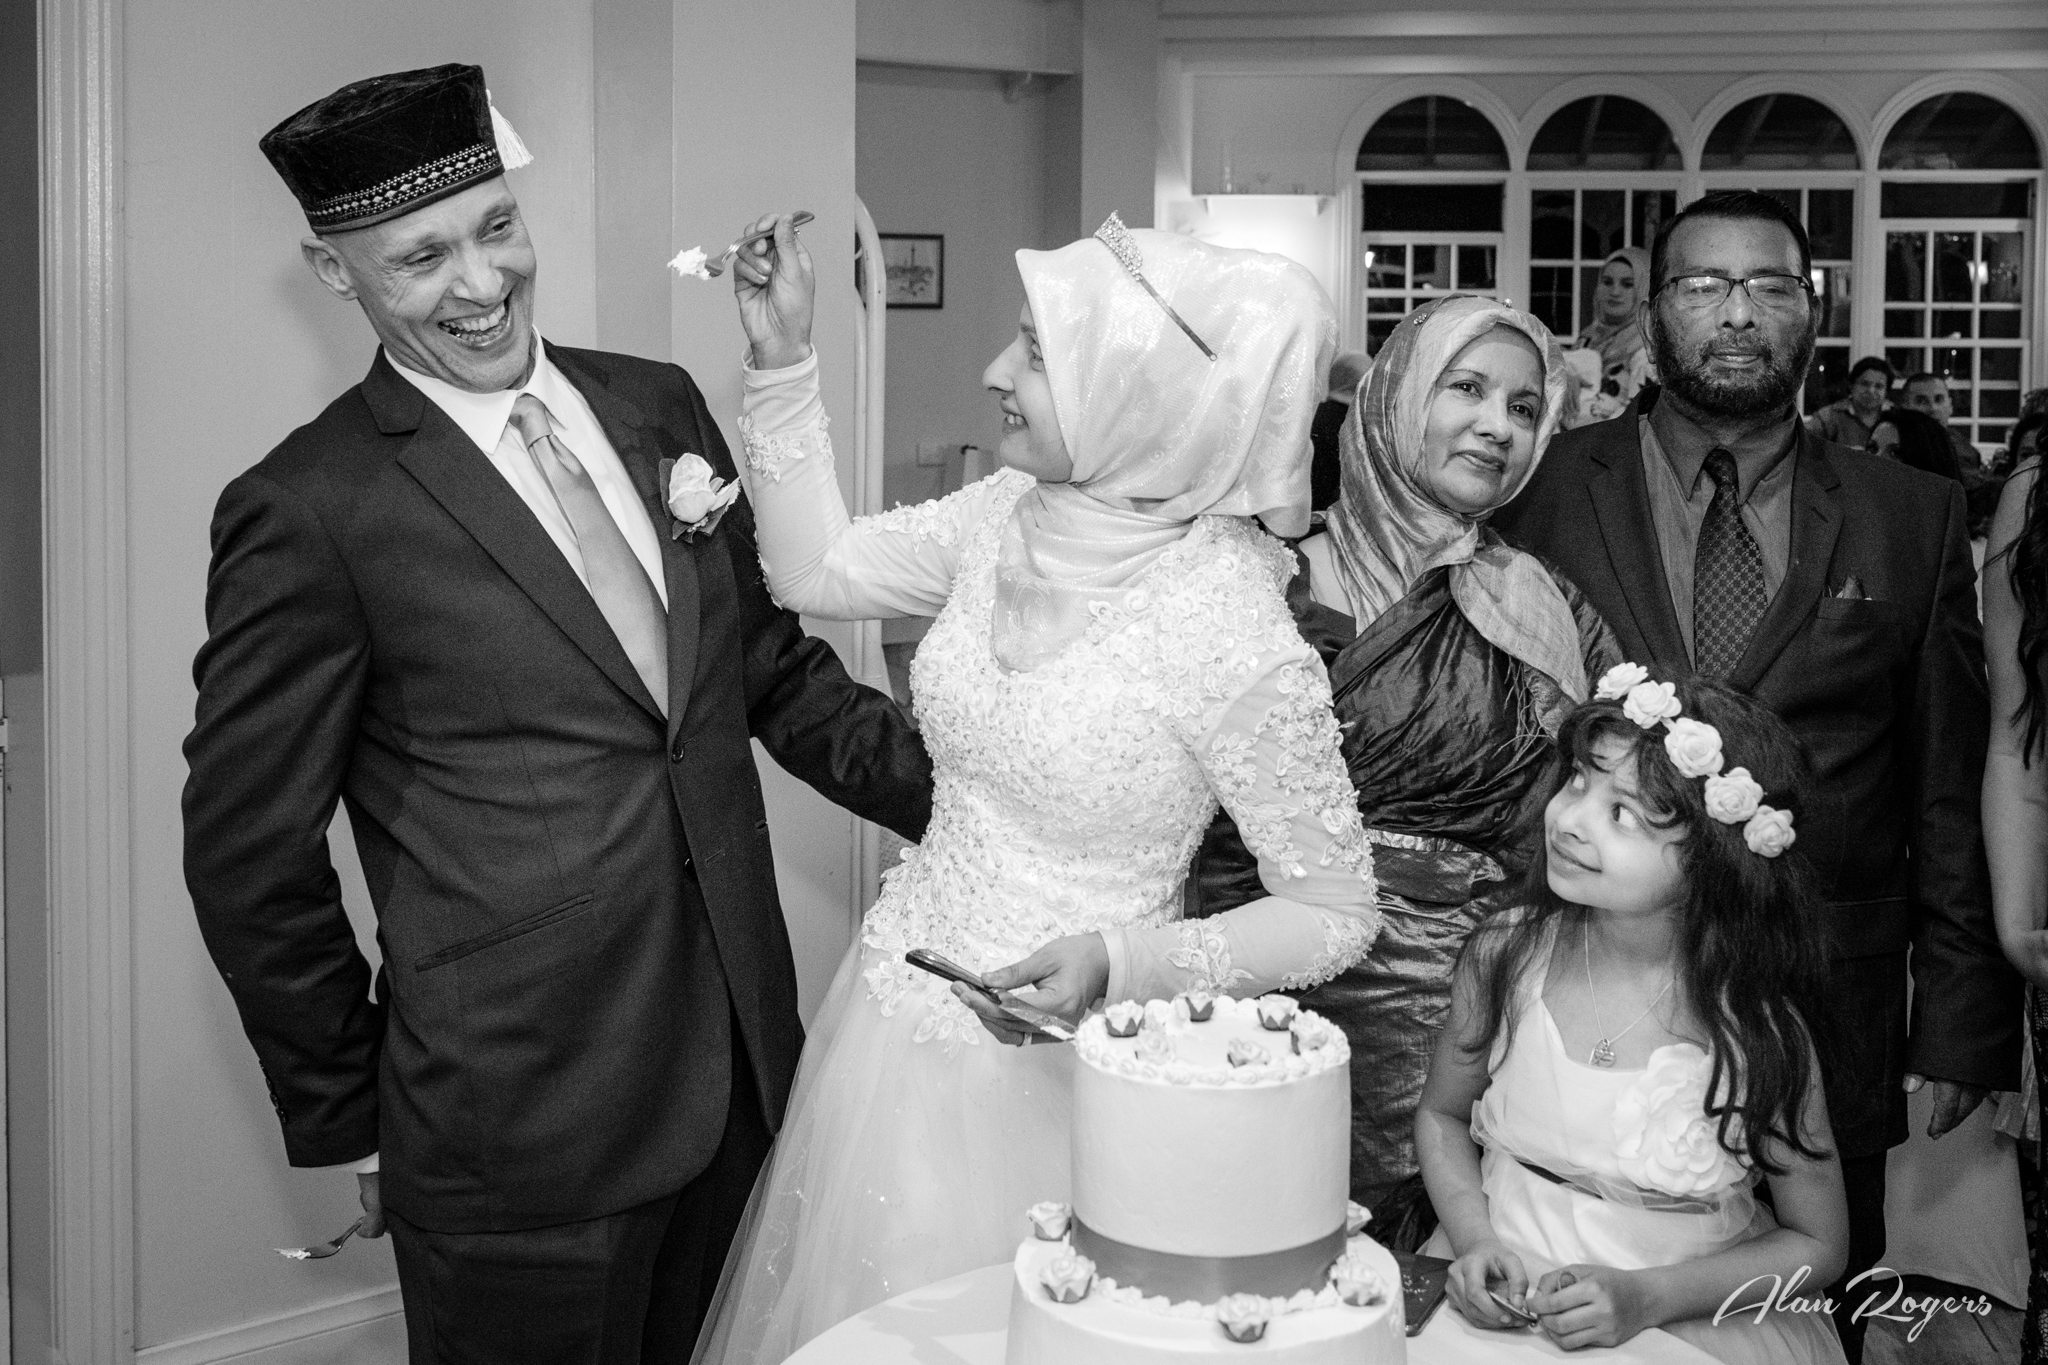 feeding-cake-groom.jpg